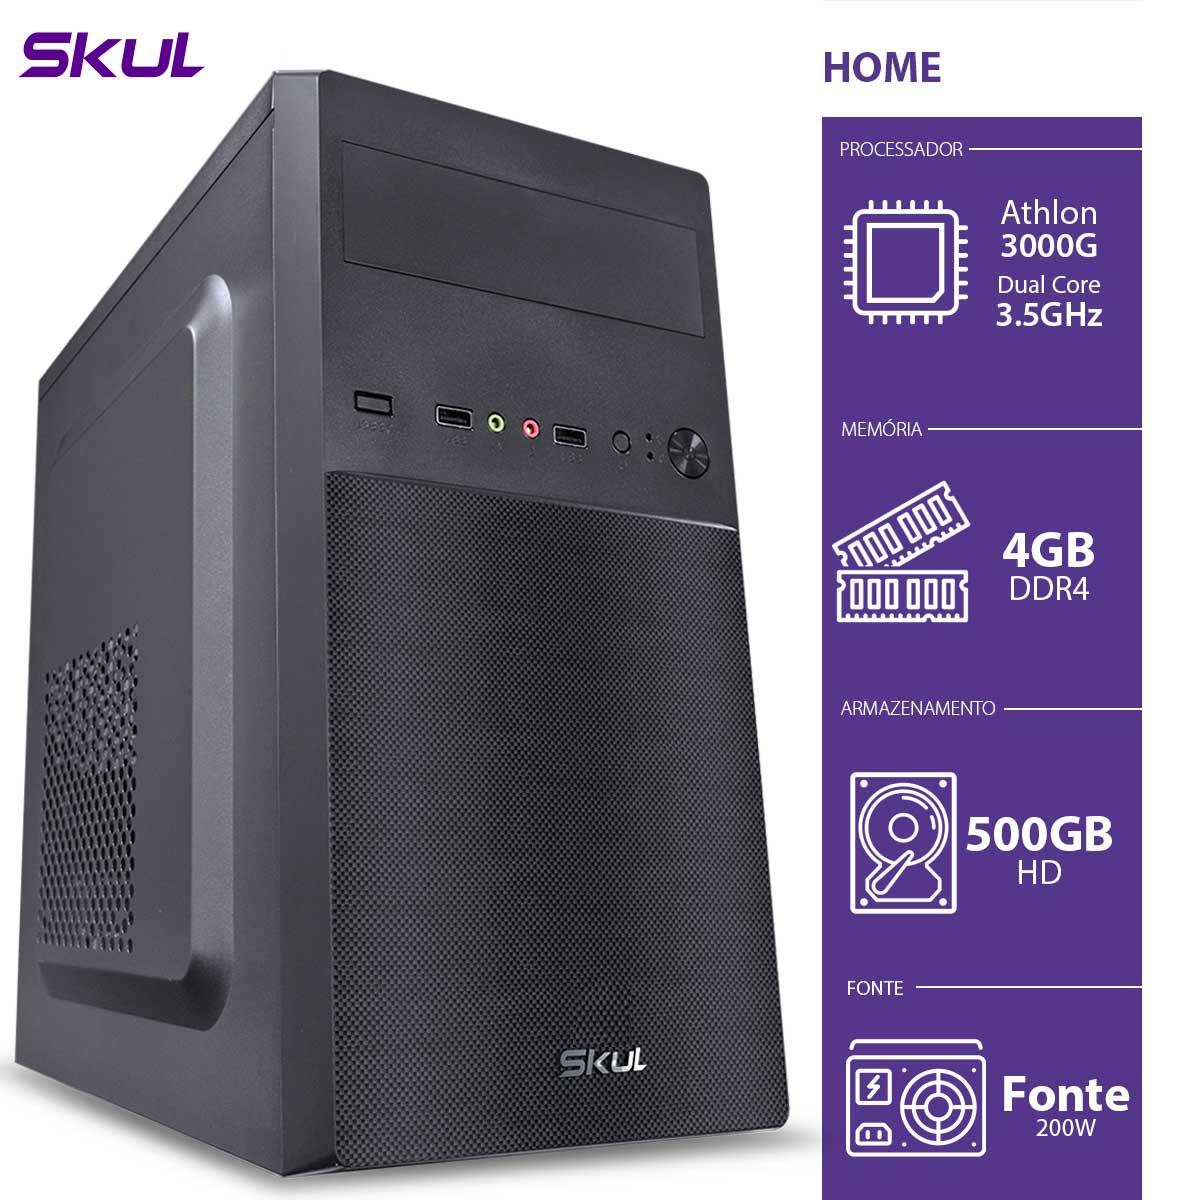 Computador Home H200 - ATHLON Dual Core 3000G 3.5GHZ 4GB DDR4 HD 500GB HDMI/VGA Fonte 200W